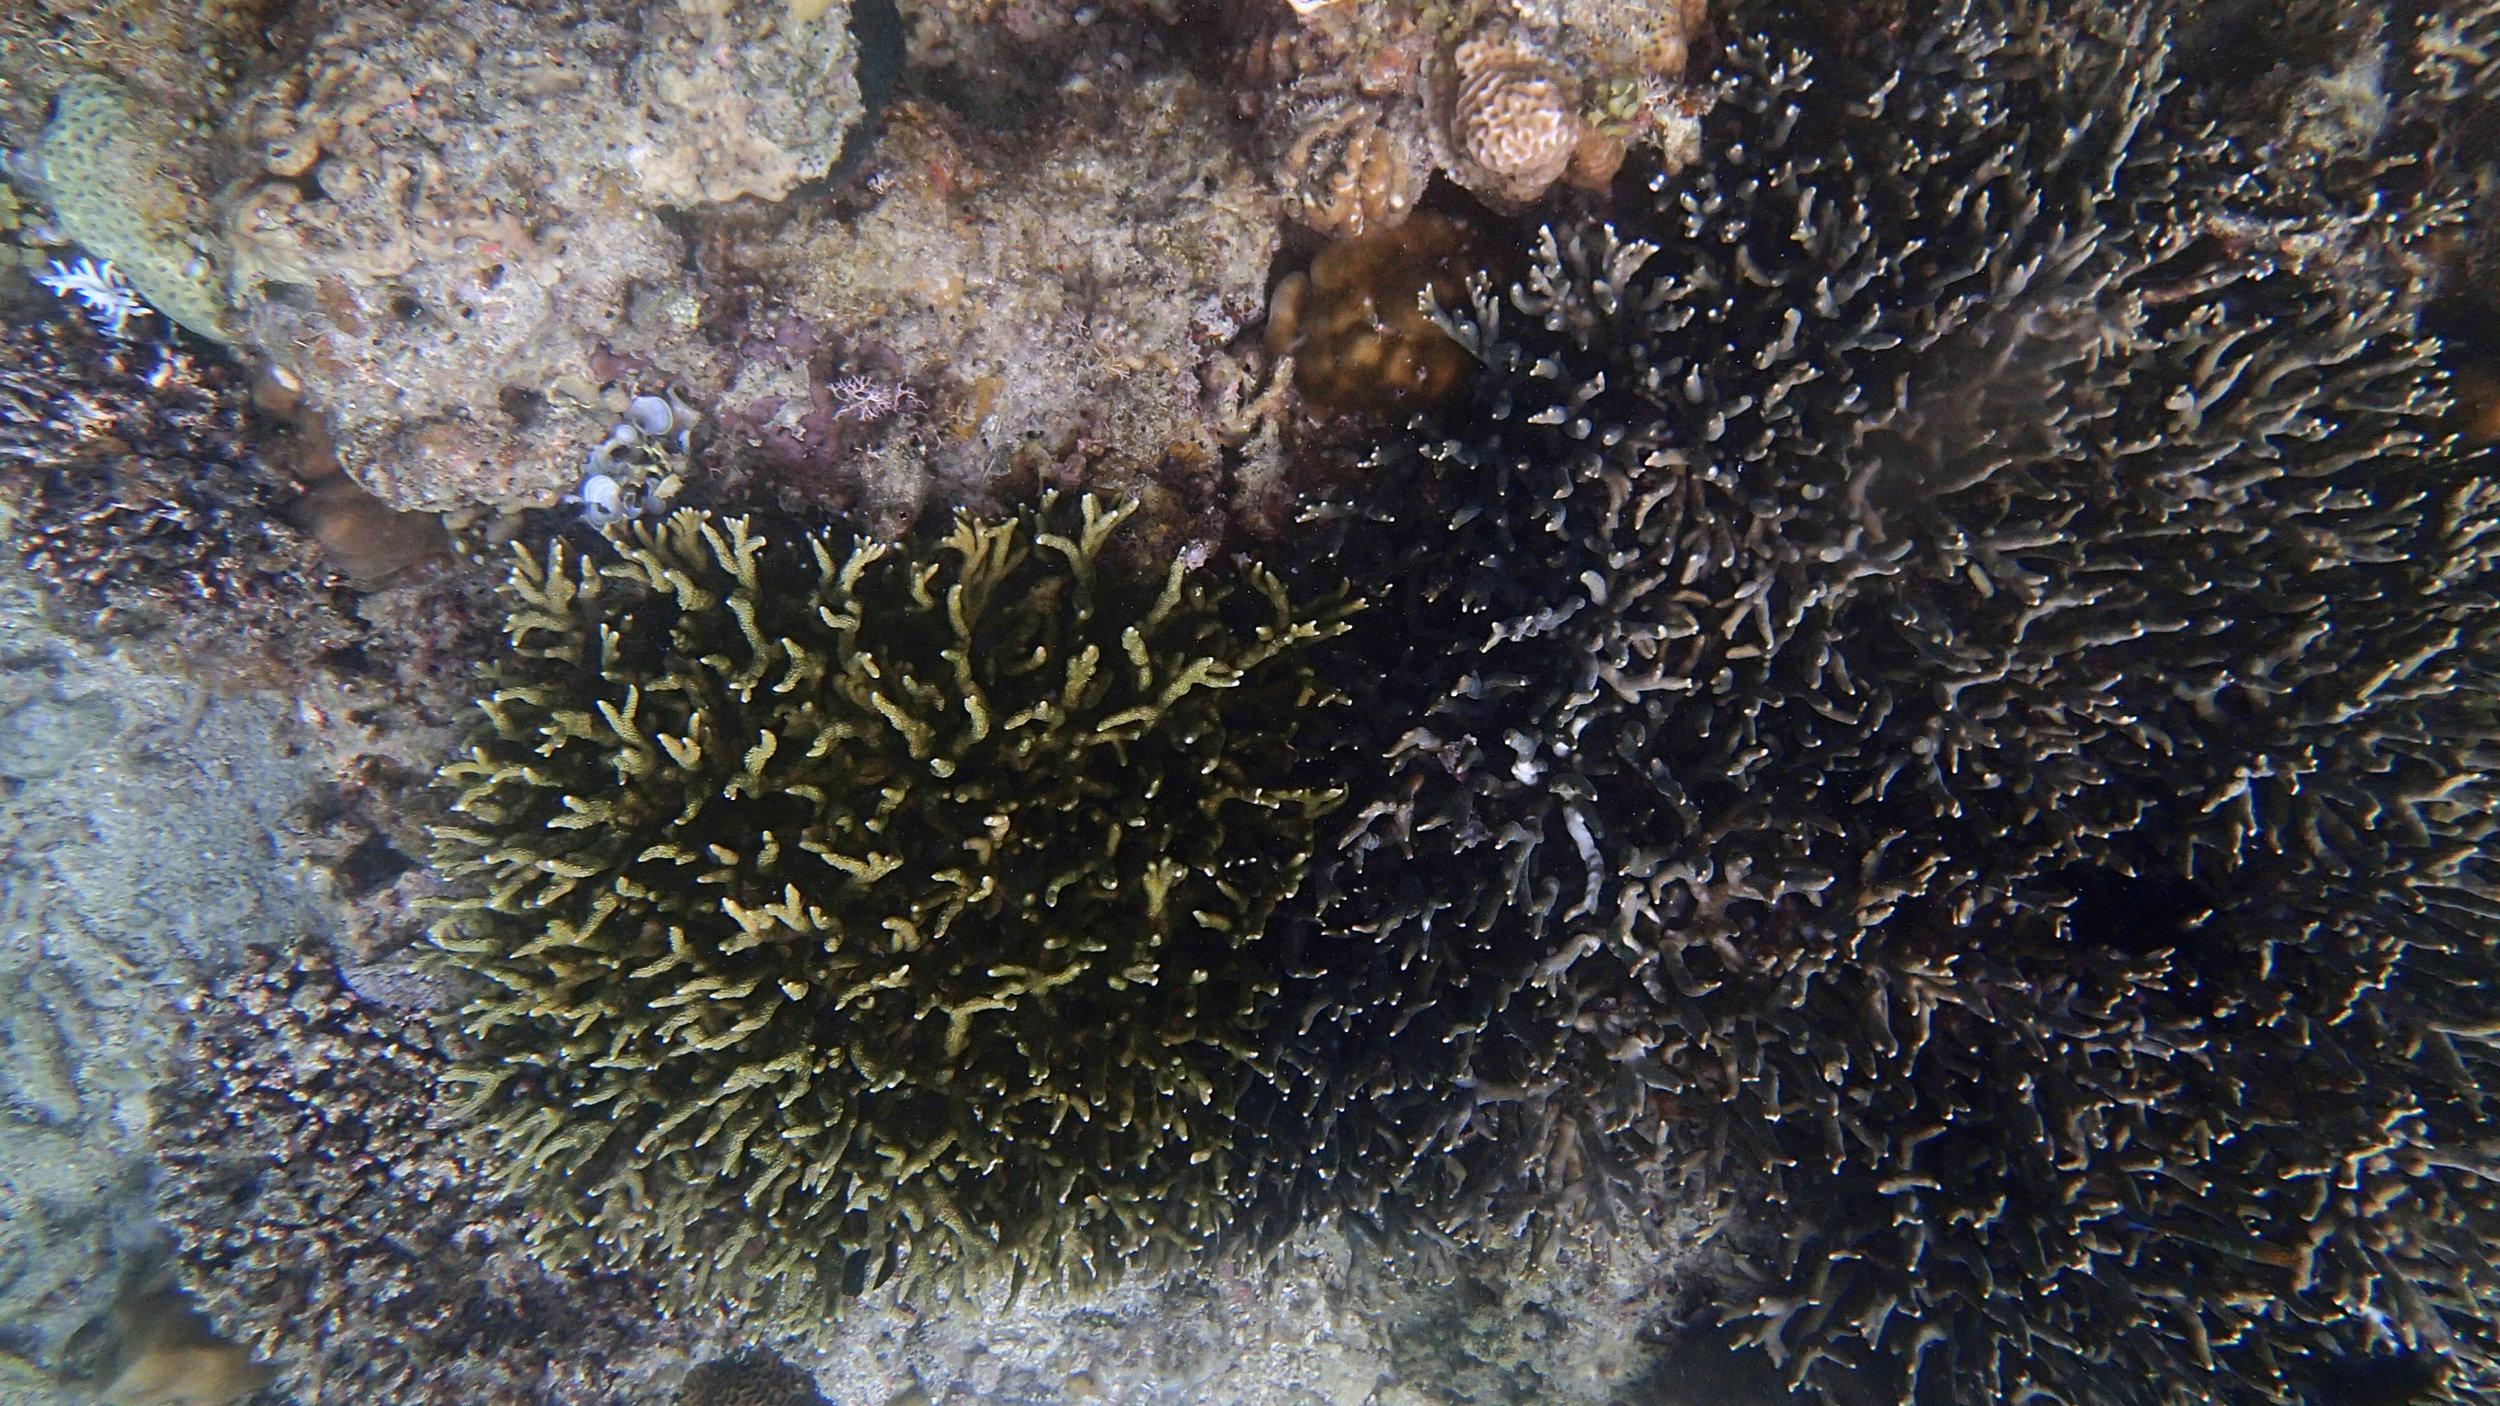 Hydnophora.jpg